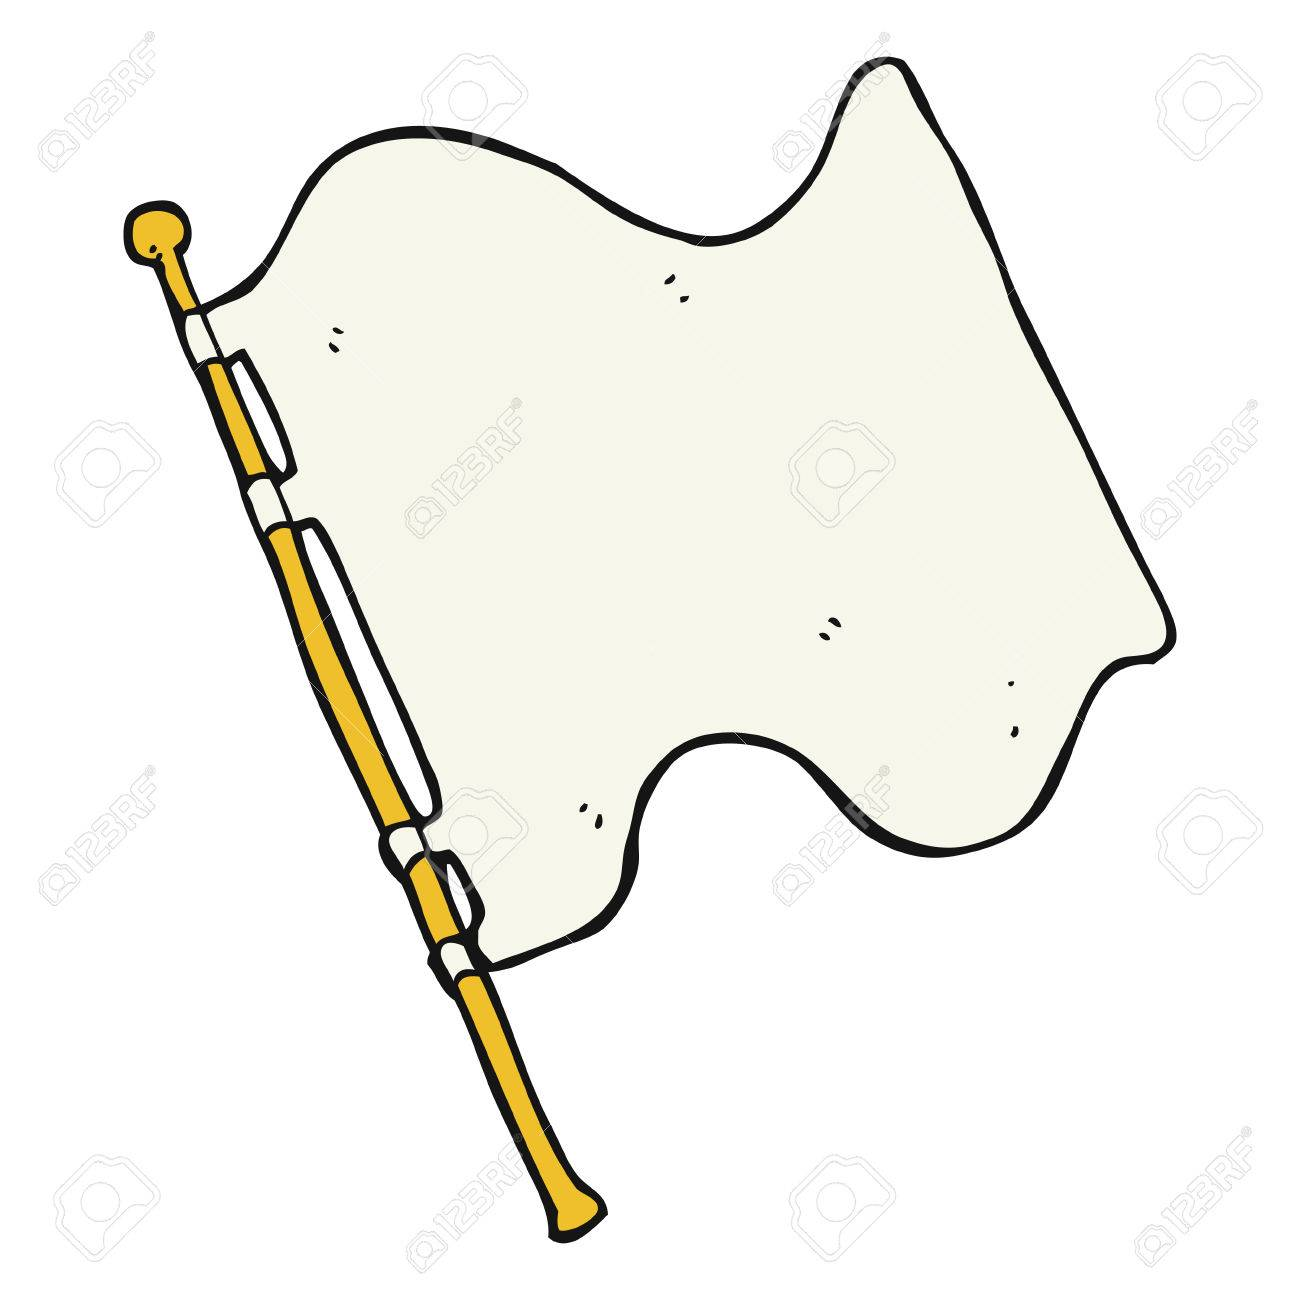 freehand drawn cartoon white flag royalty free cliparts vectors rh 123rf com waving white flag clip art black and white checkered flag clip art